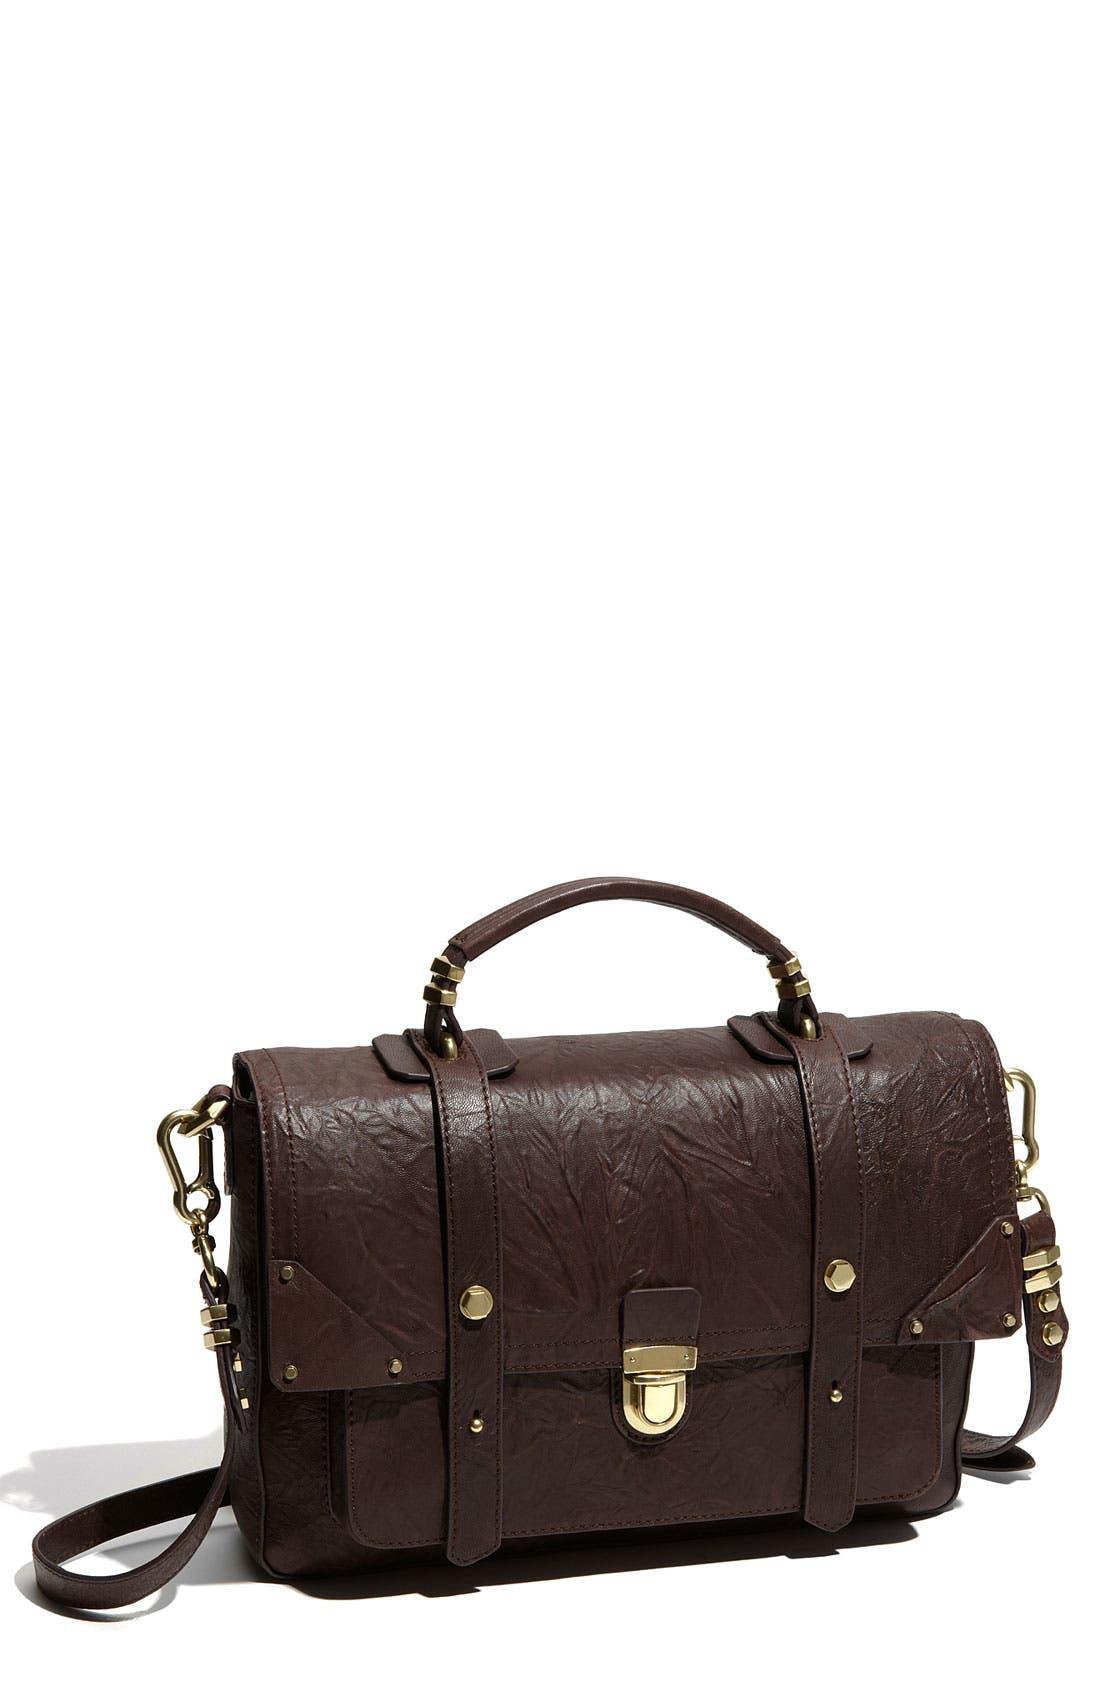 Alternate Image 1 Selected - Oryany Leather Flap Satchel